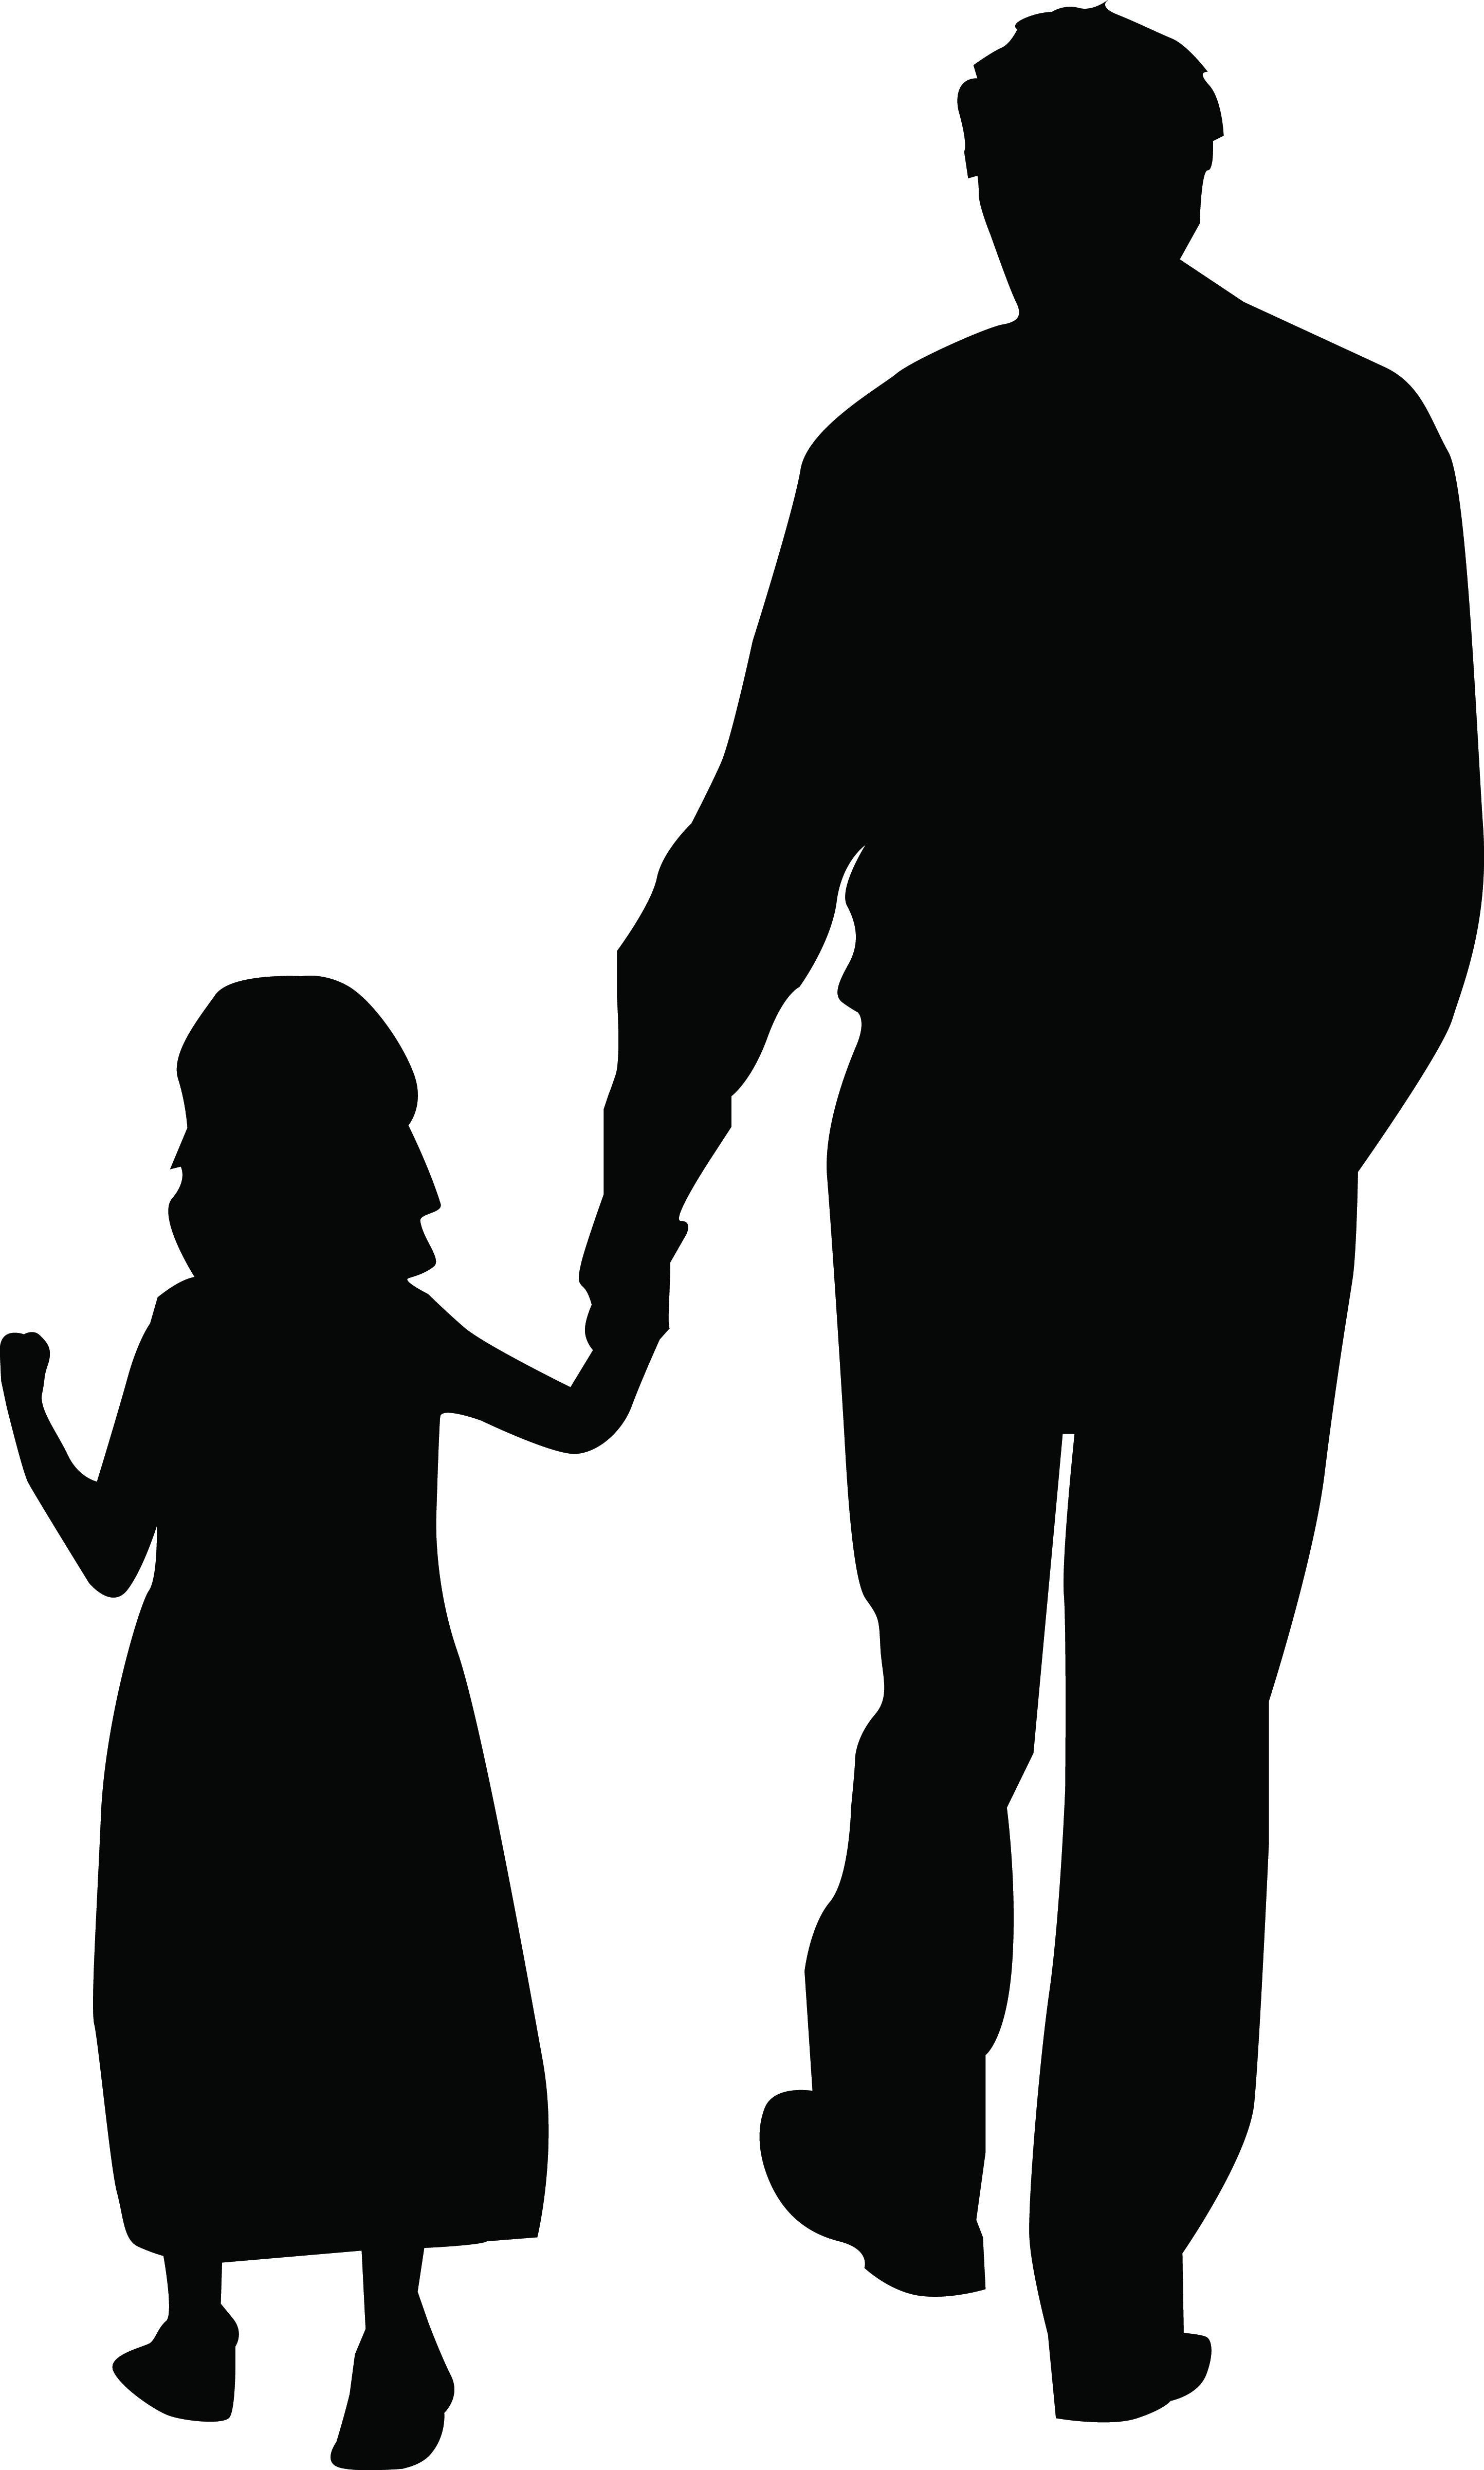 2887x4805 Best Of People Clipart Silhouette Walking Single Image